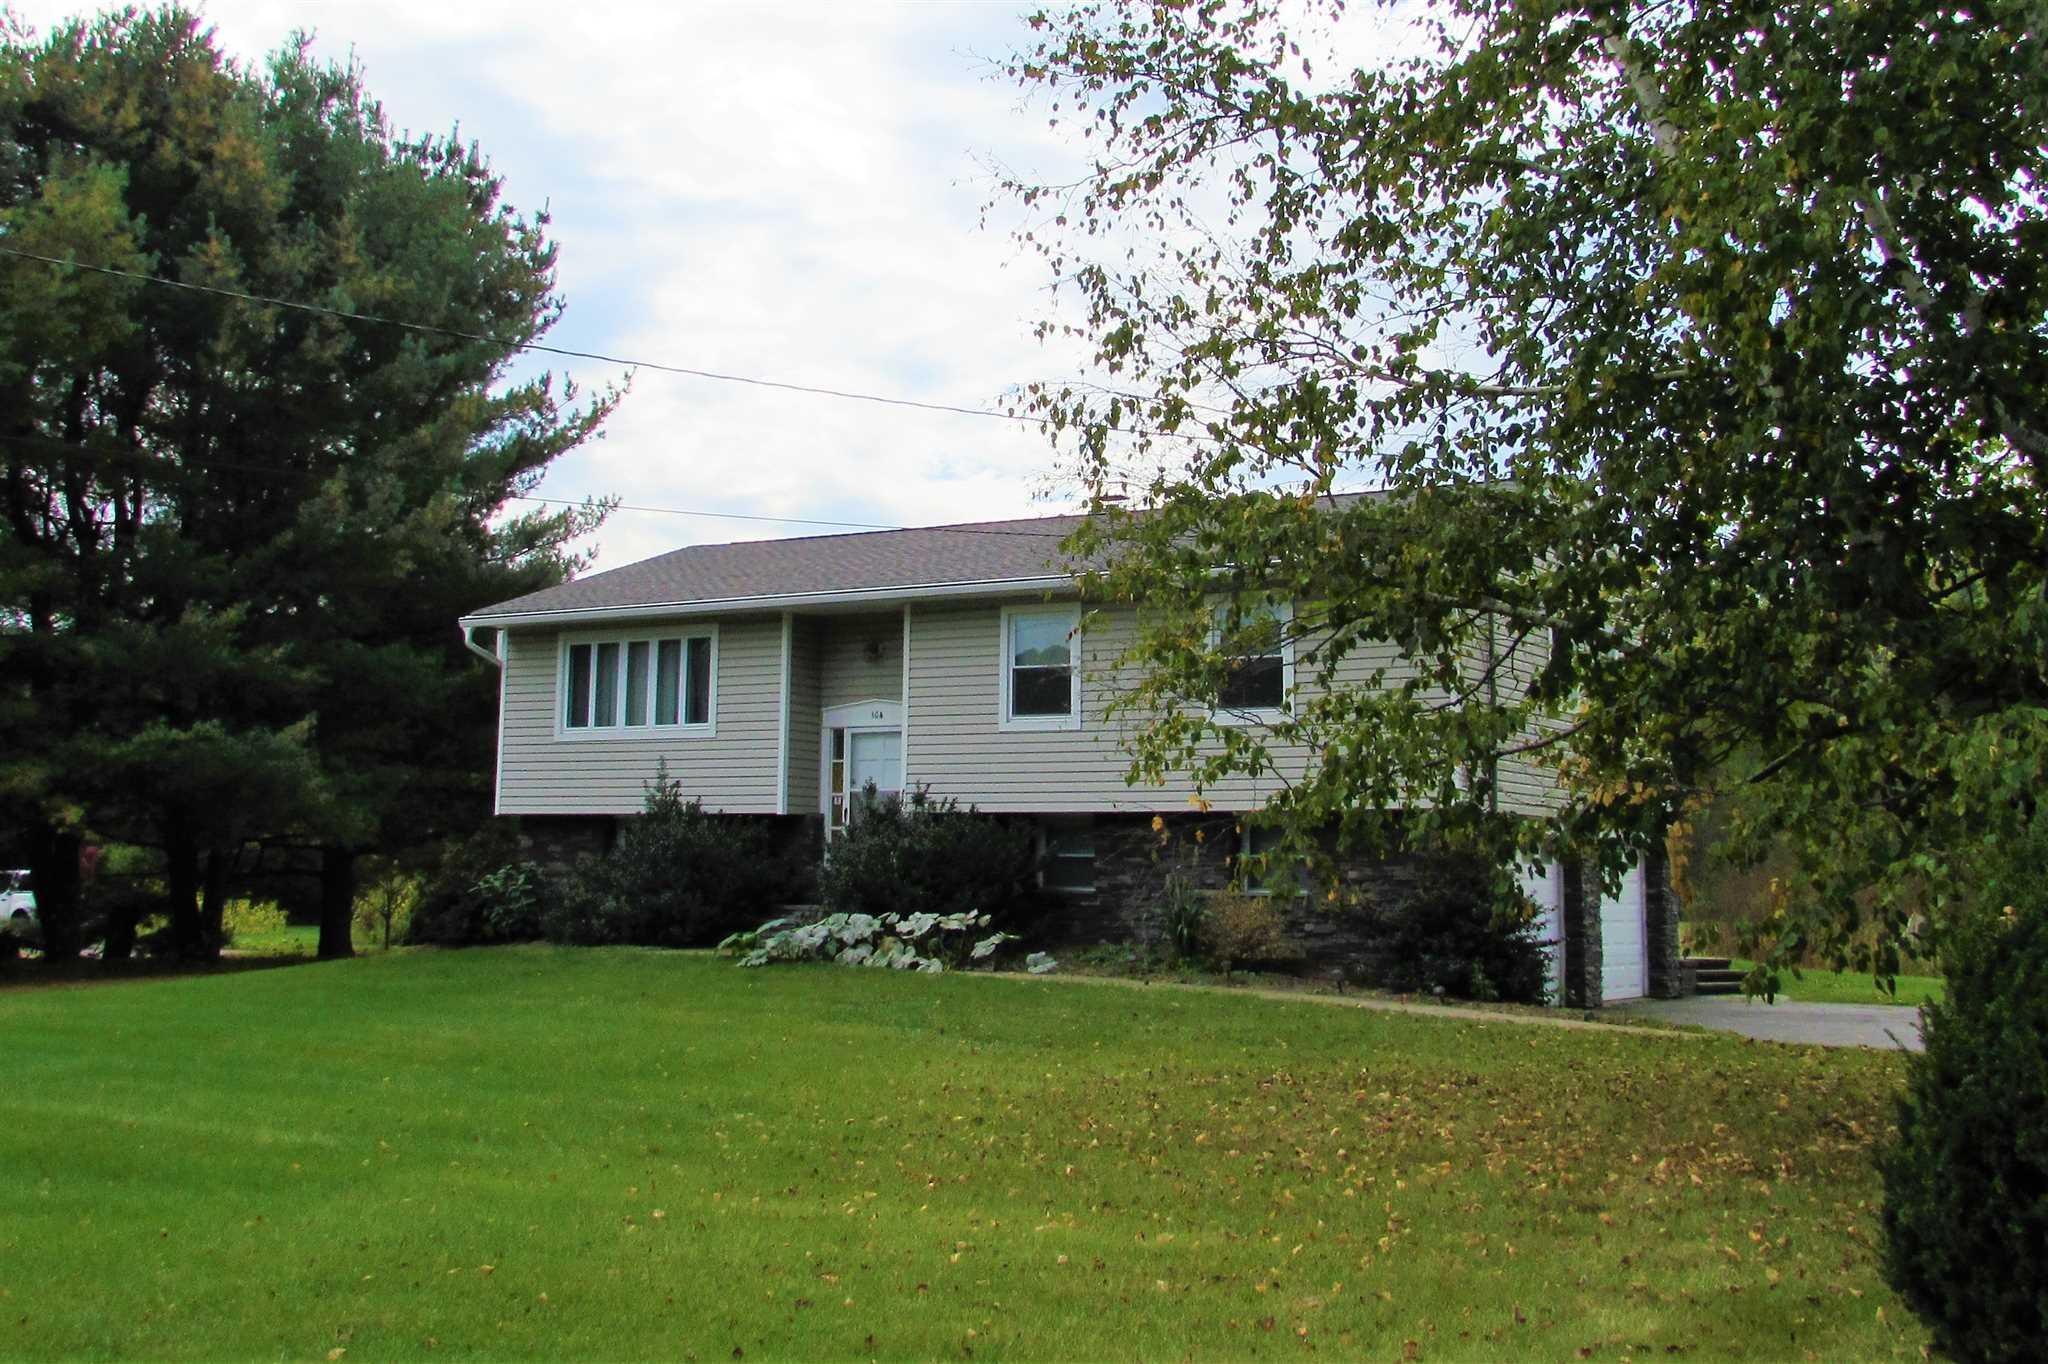 Single Family Home for Sale at 104 CRAIG LANE 104 CRAIG LANE Dover Plains, New York 12522 United States